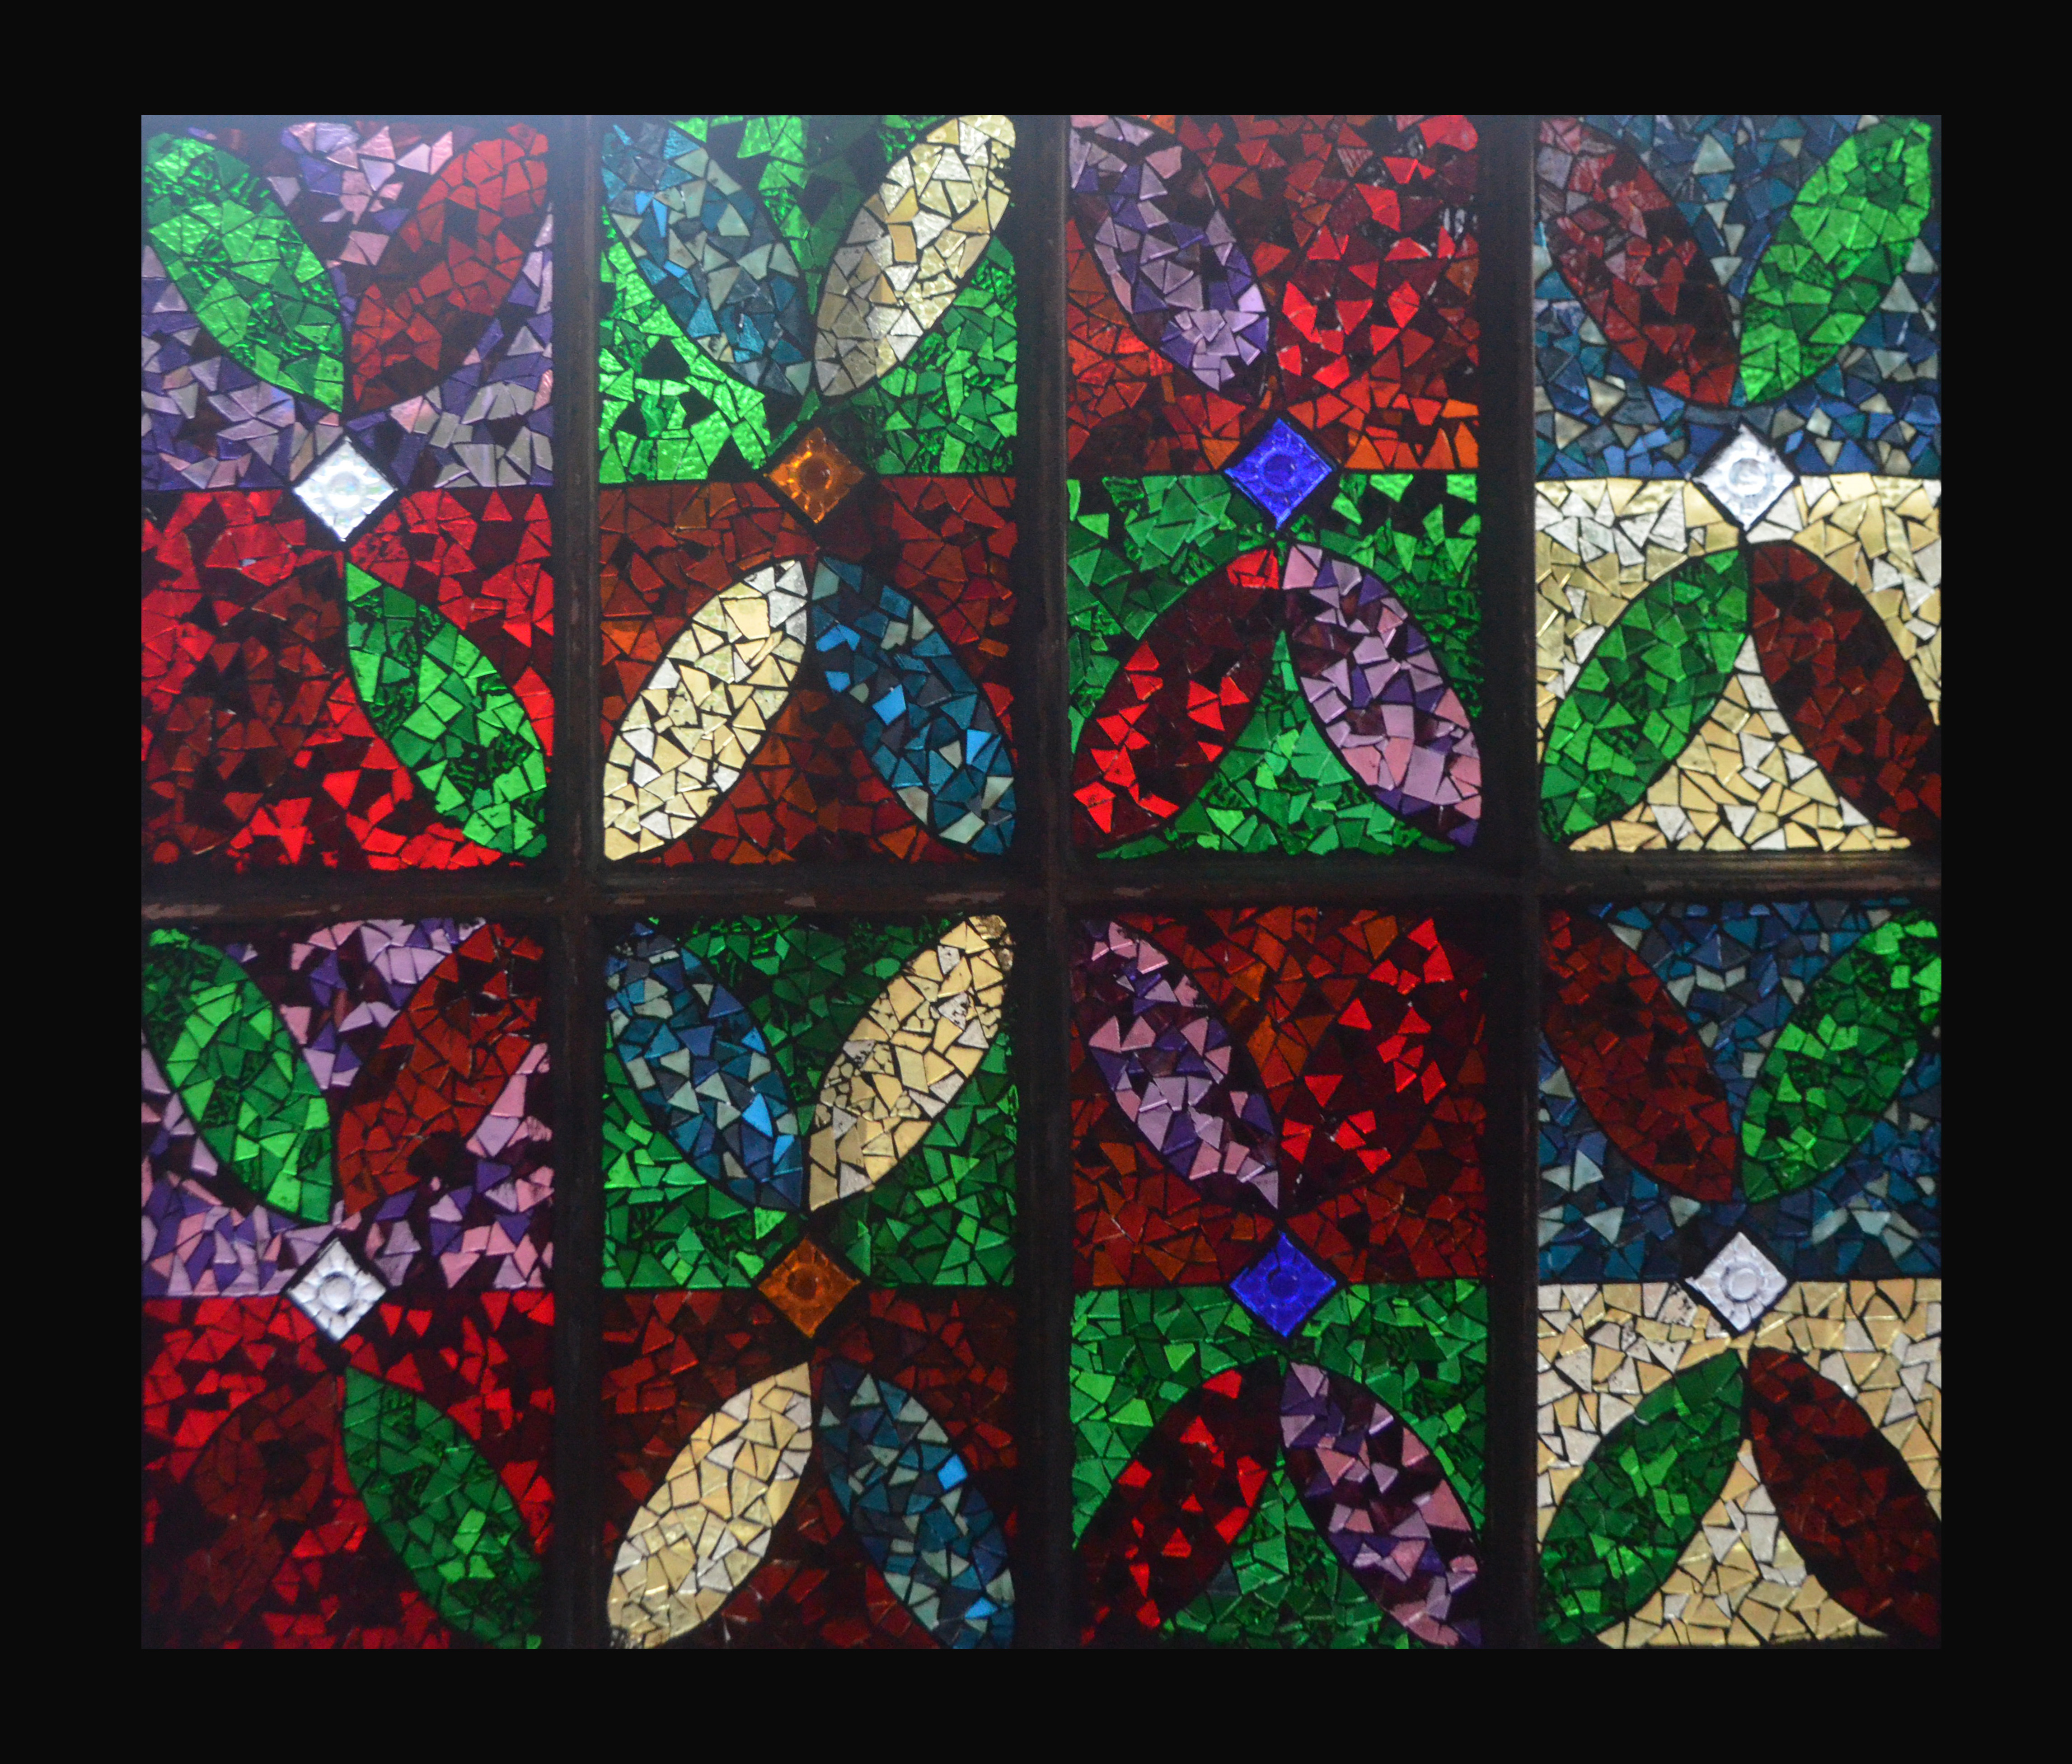 grandmas-quilt-kory-dollar-marvelous-mosaic.jpg